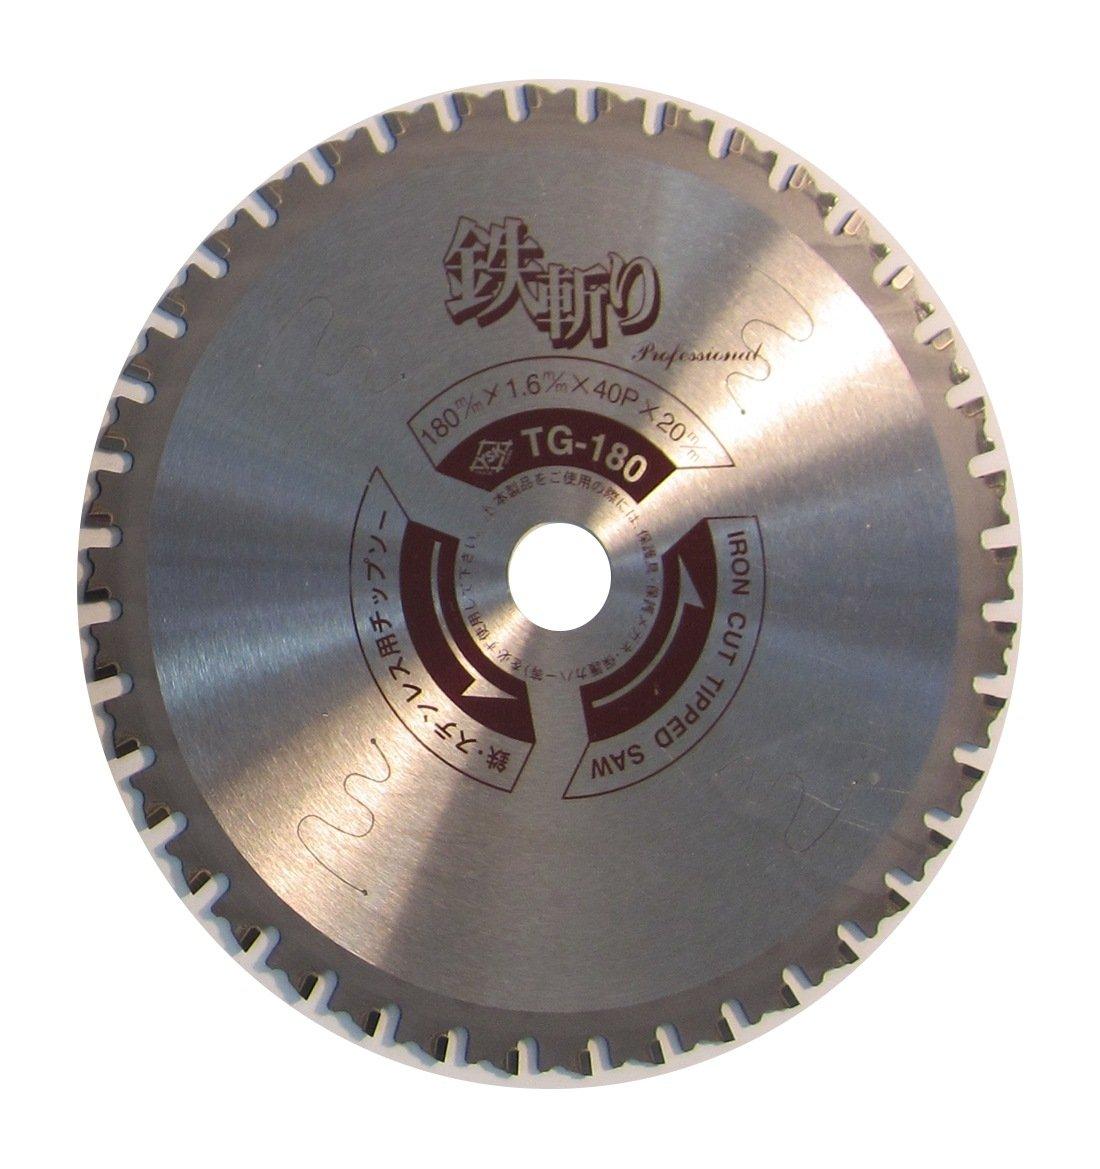 YSK工業 鉄斬り 305×2.2×56p×25.4 鉄ステンレス用サーメットチップソー TG-305 消音レーザー入り 低速用 B00AH4R5FC 305X2.2X56PX25.4 305X2.2X56PX25.4